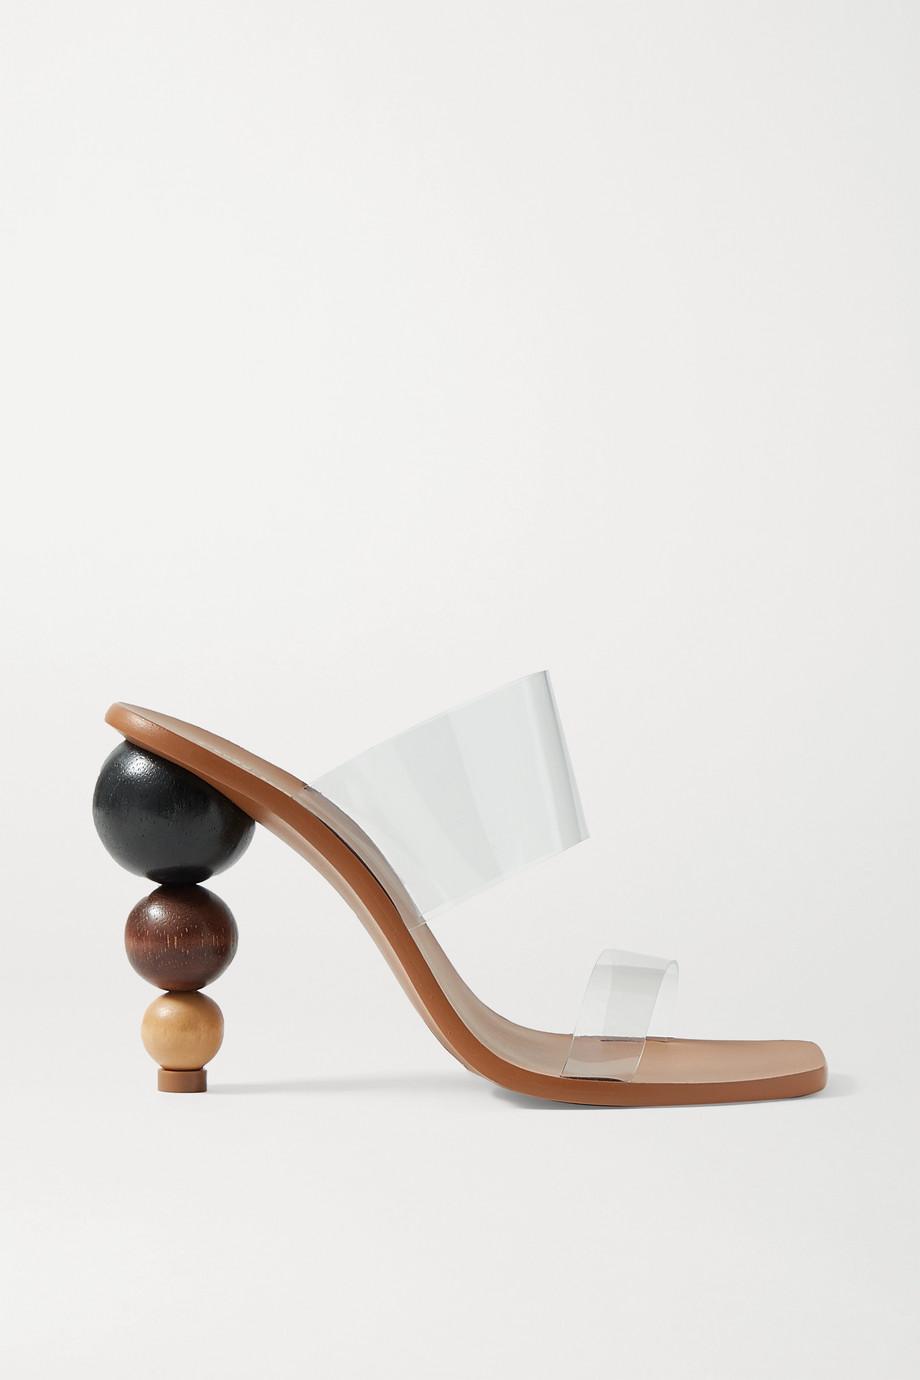 Cult Gaia Vita PVC sandals